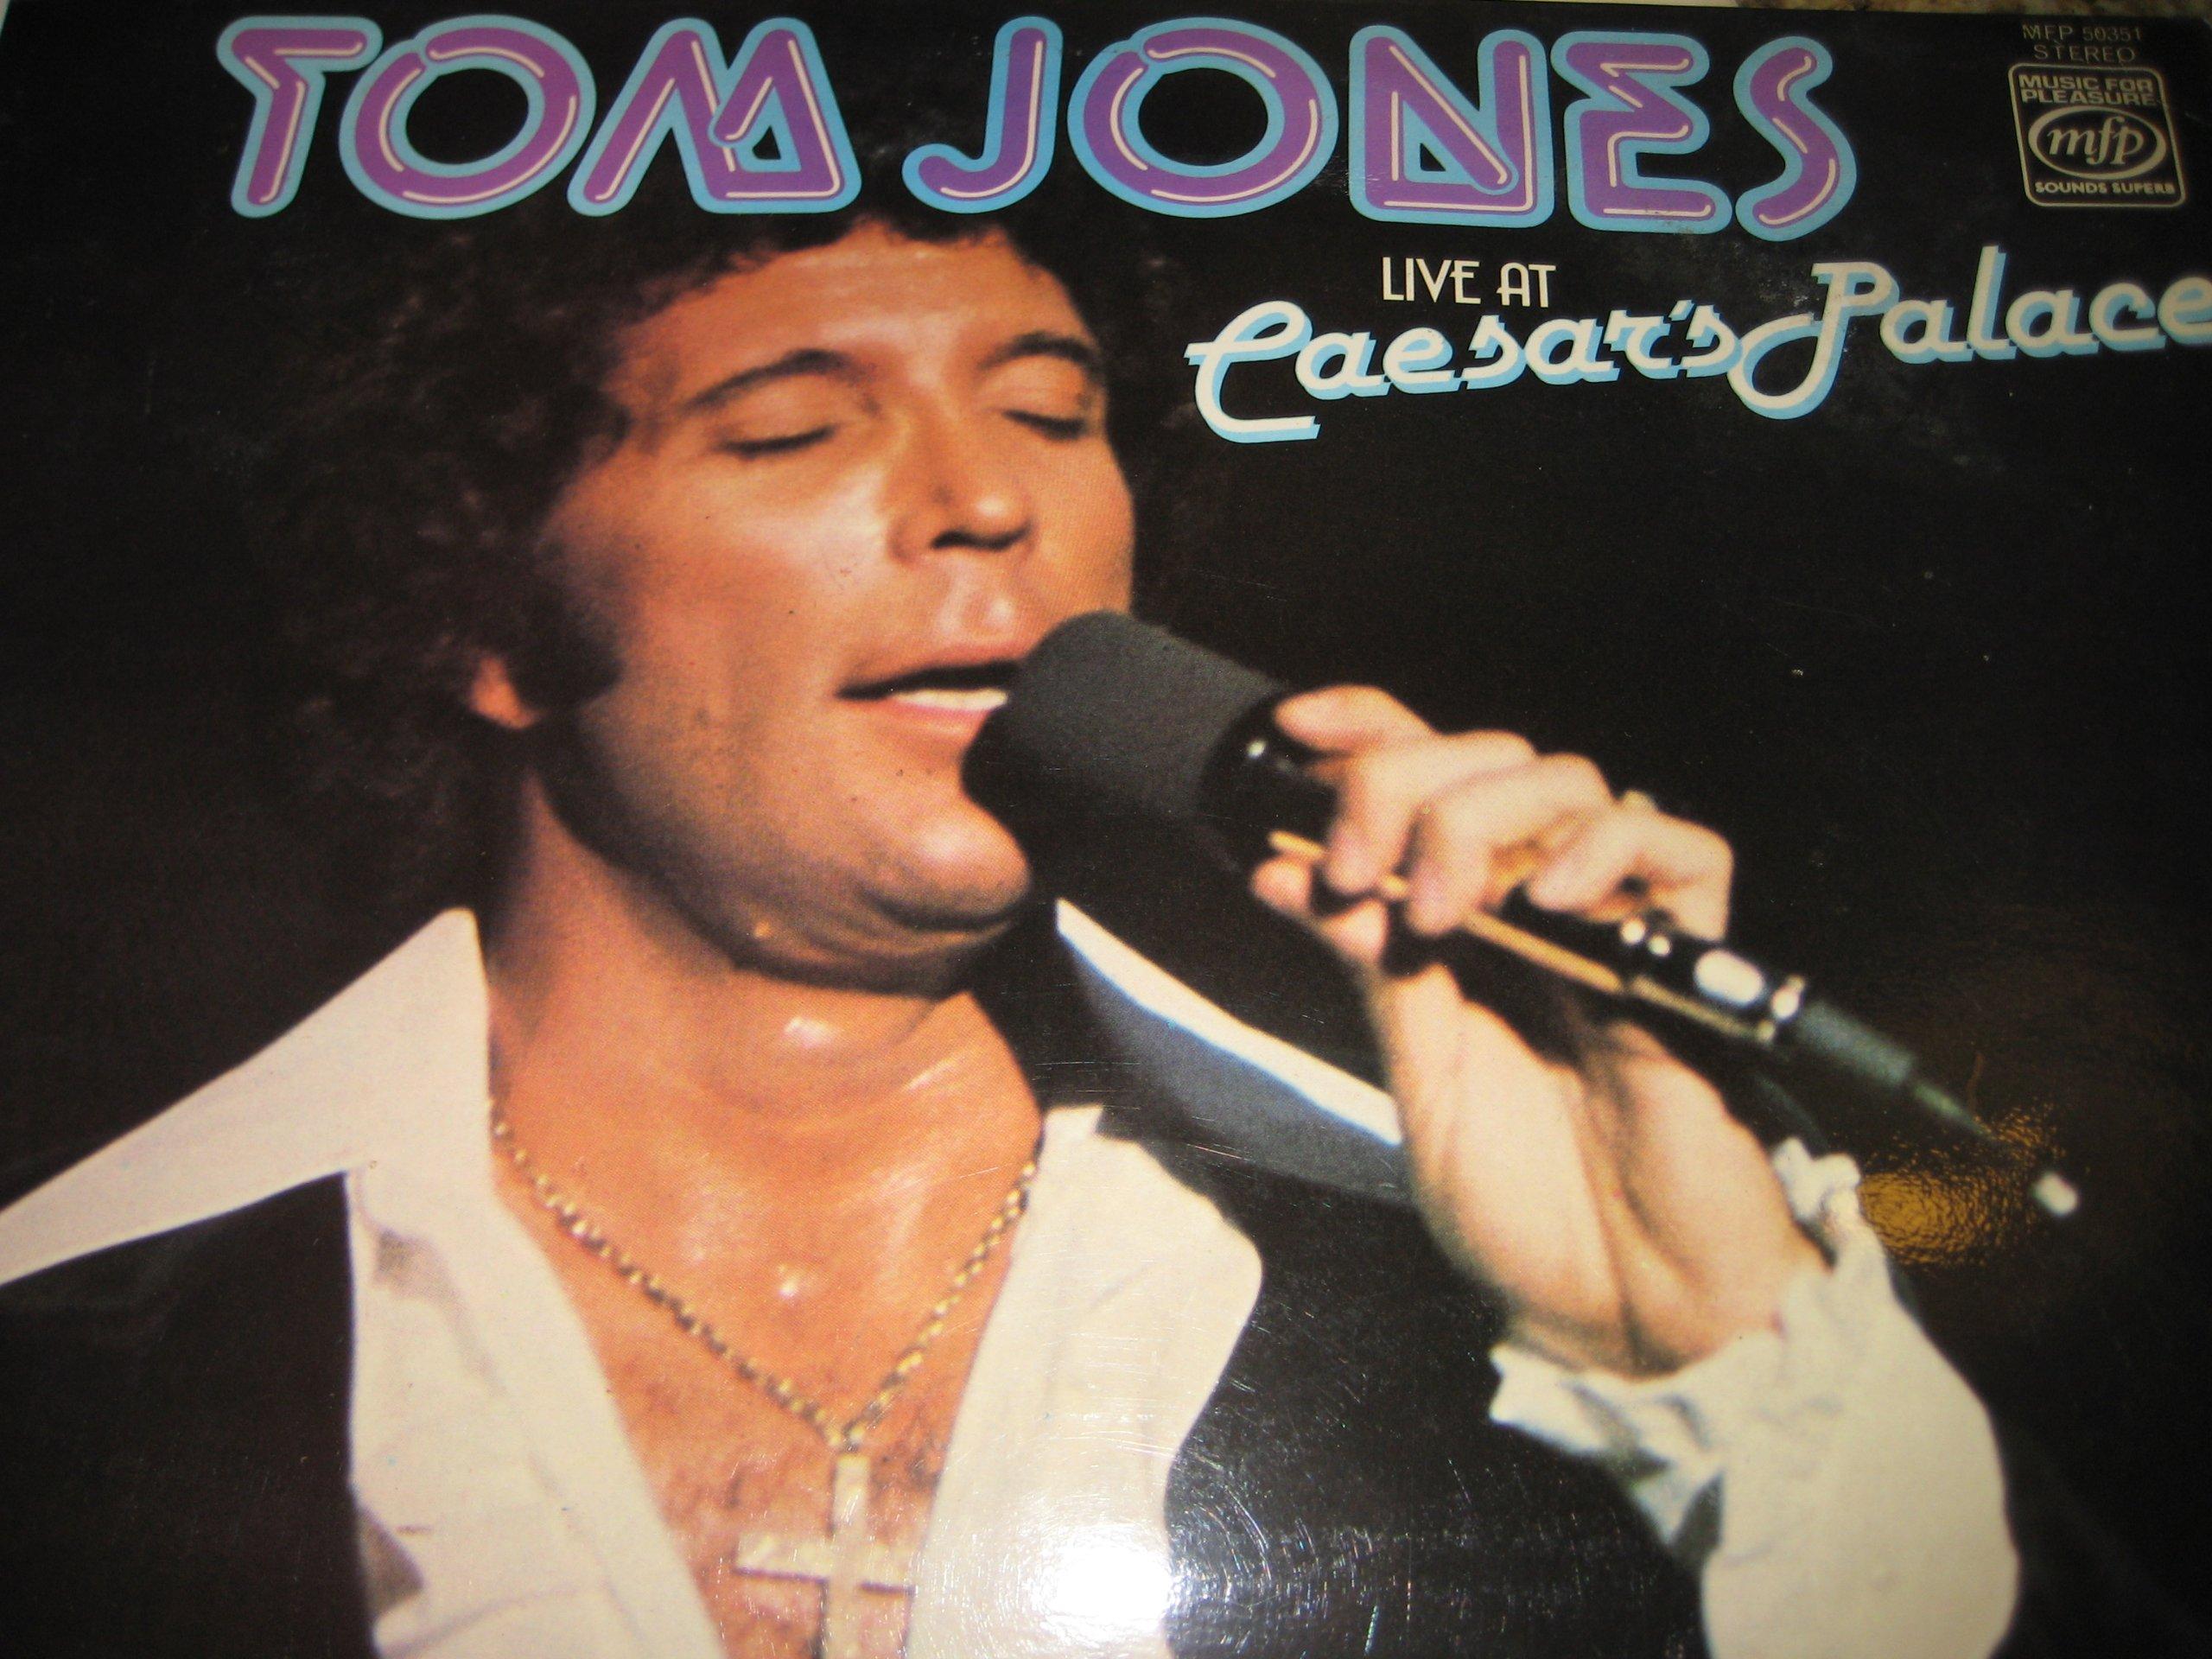 Tom Jones Live at Caesar's Palace [Rare Music For Pleasure Label]